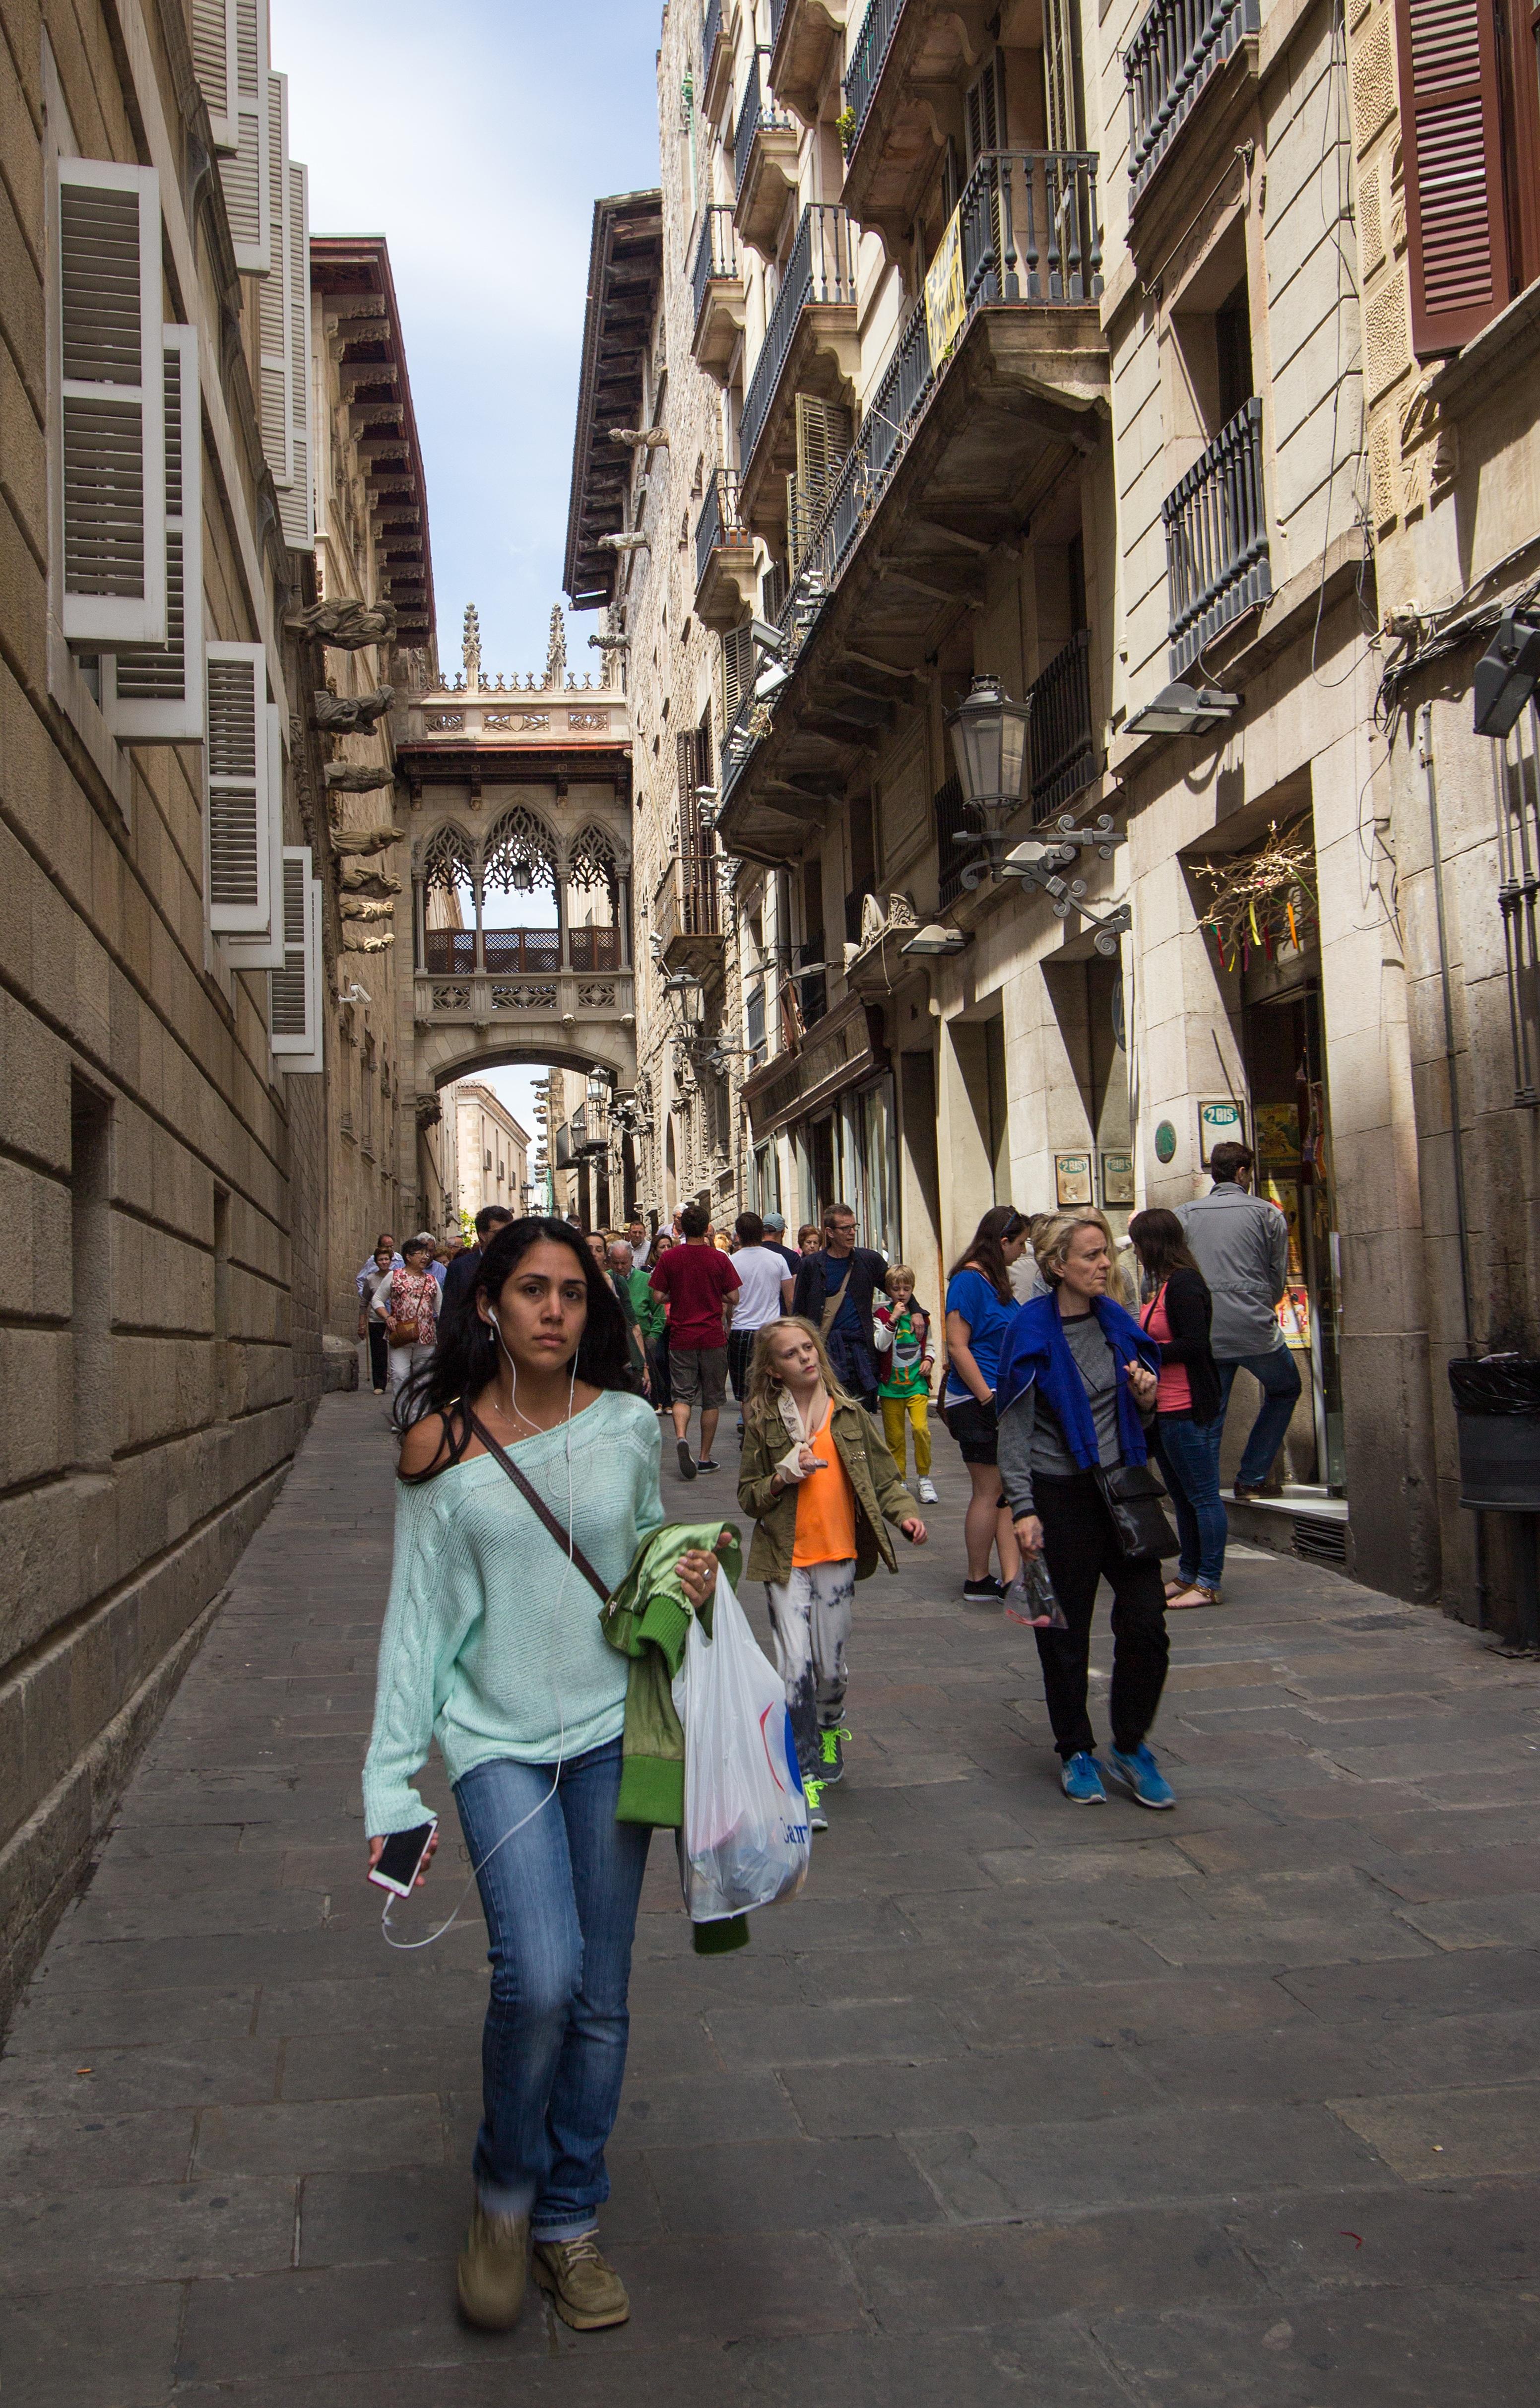 Fotos Gratis Peatonal Arquitectura Ni 241 A La Carretera